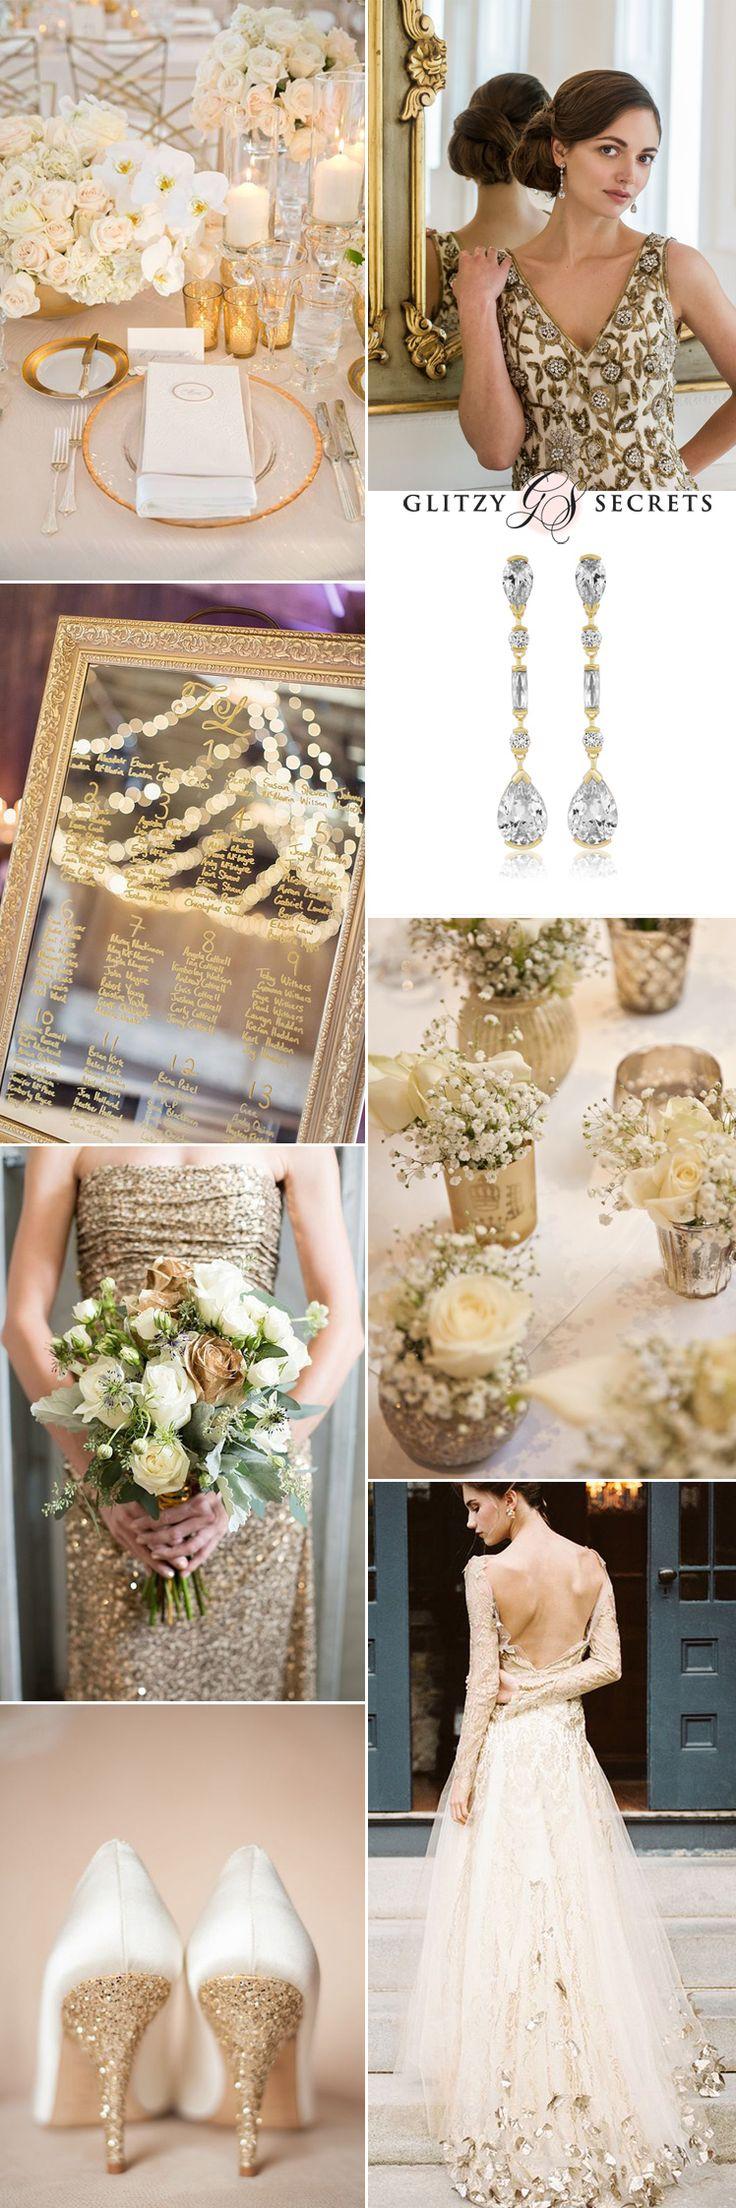 Best 25+ Gold wedding theme ideas on Pinterest | Gold ...